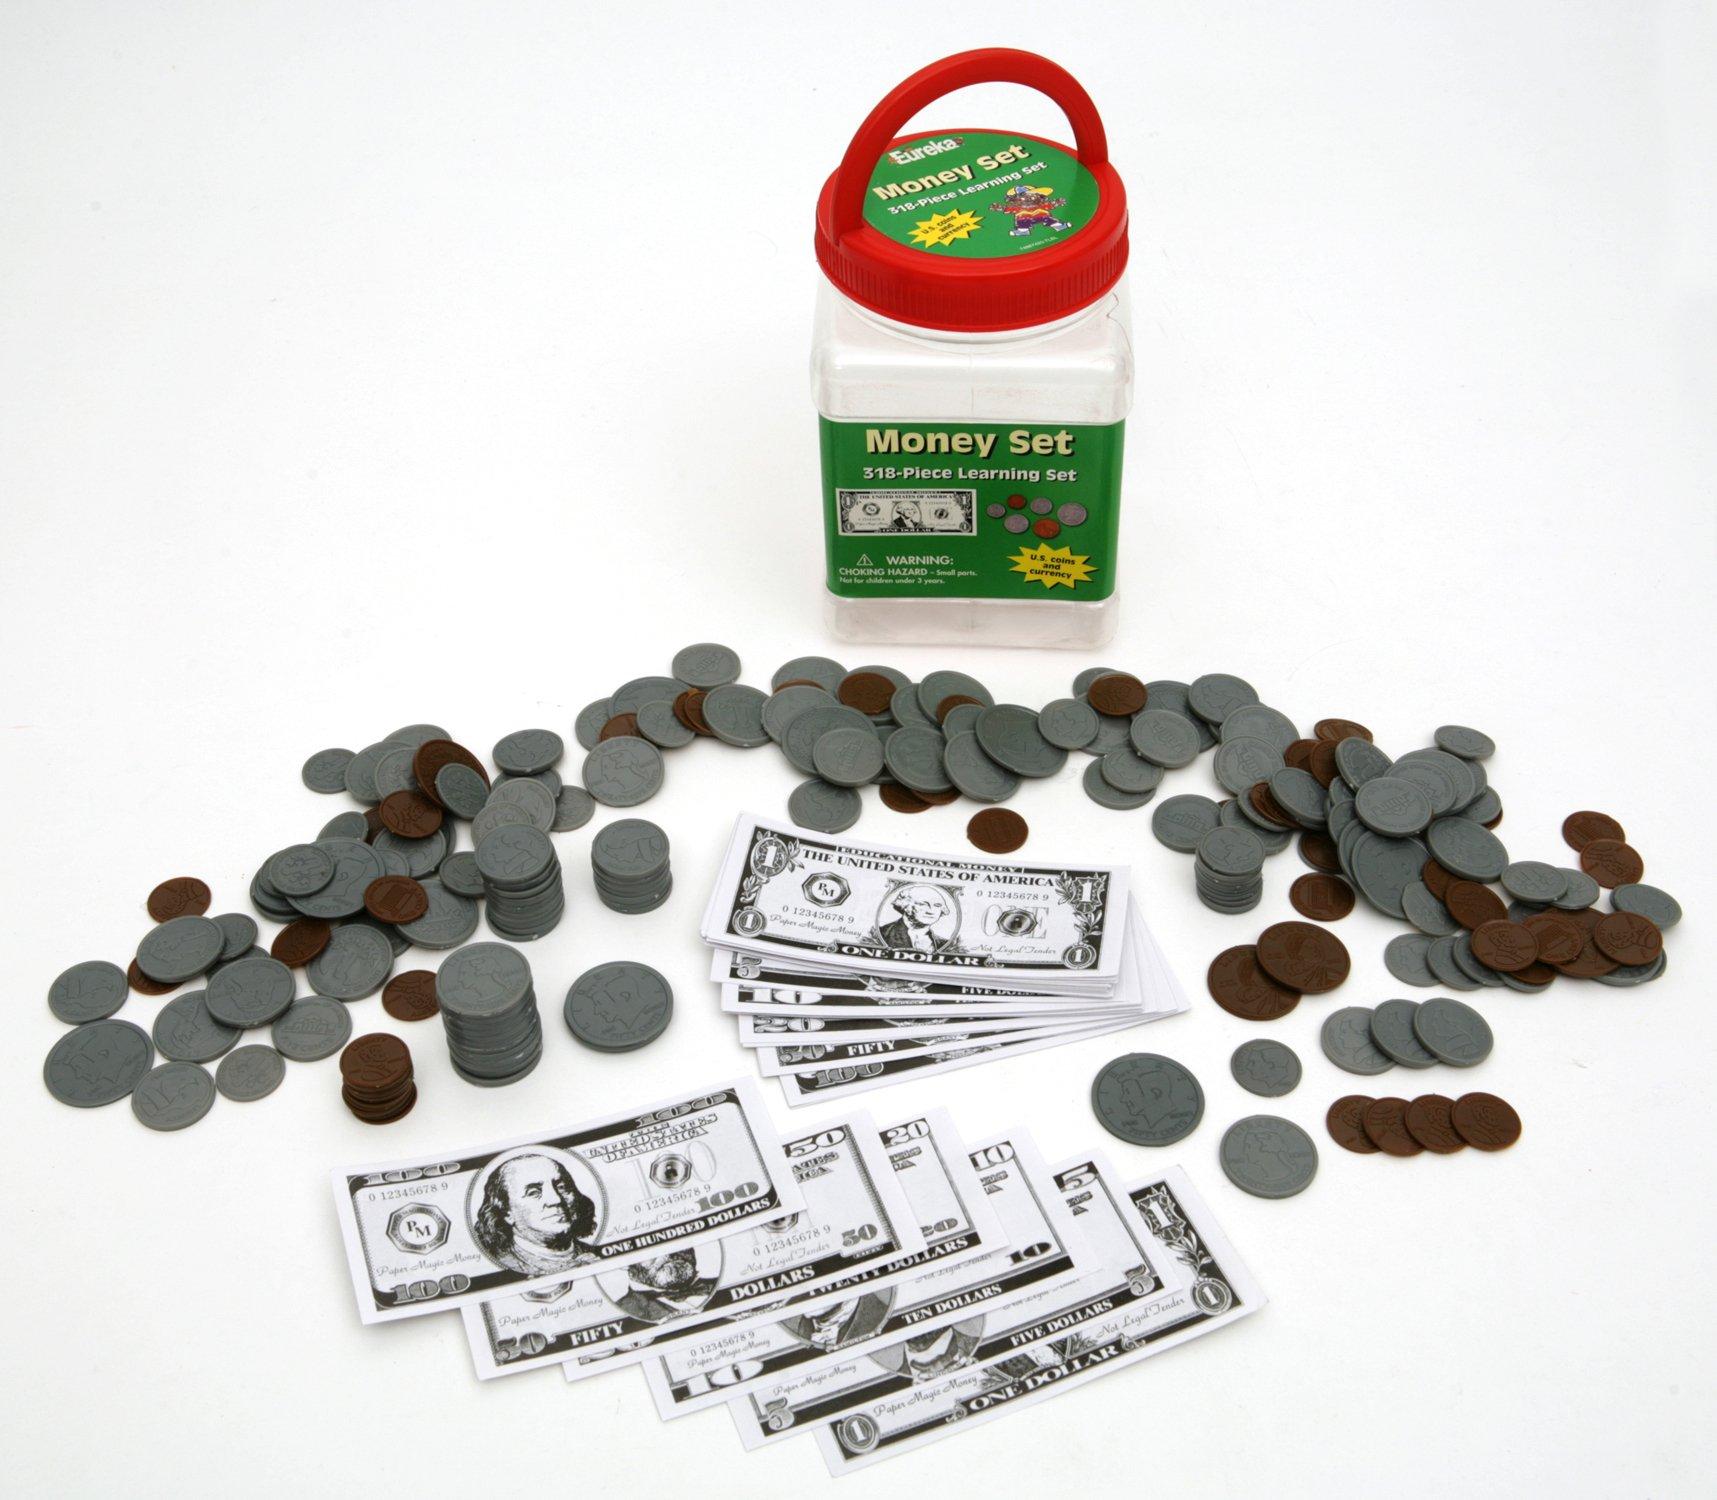 Eureka Tub Of Money, 318 Pieces in 3 3/4'' x 5 1/2'' x 3 3/4'' Tub